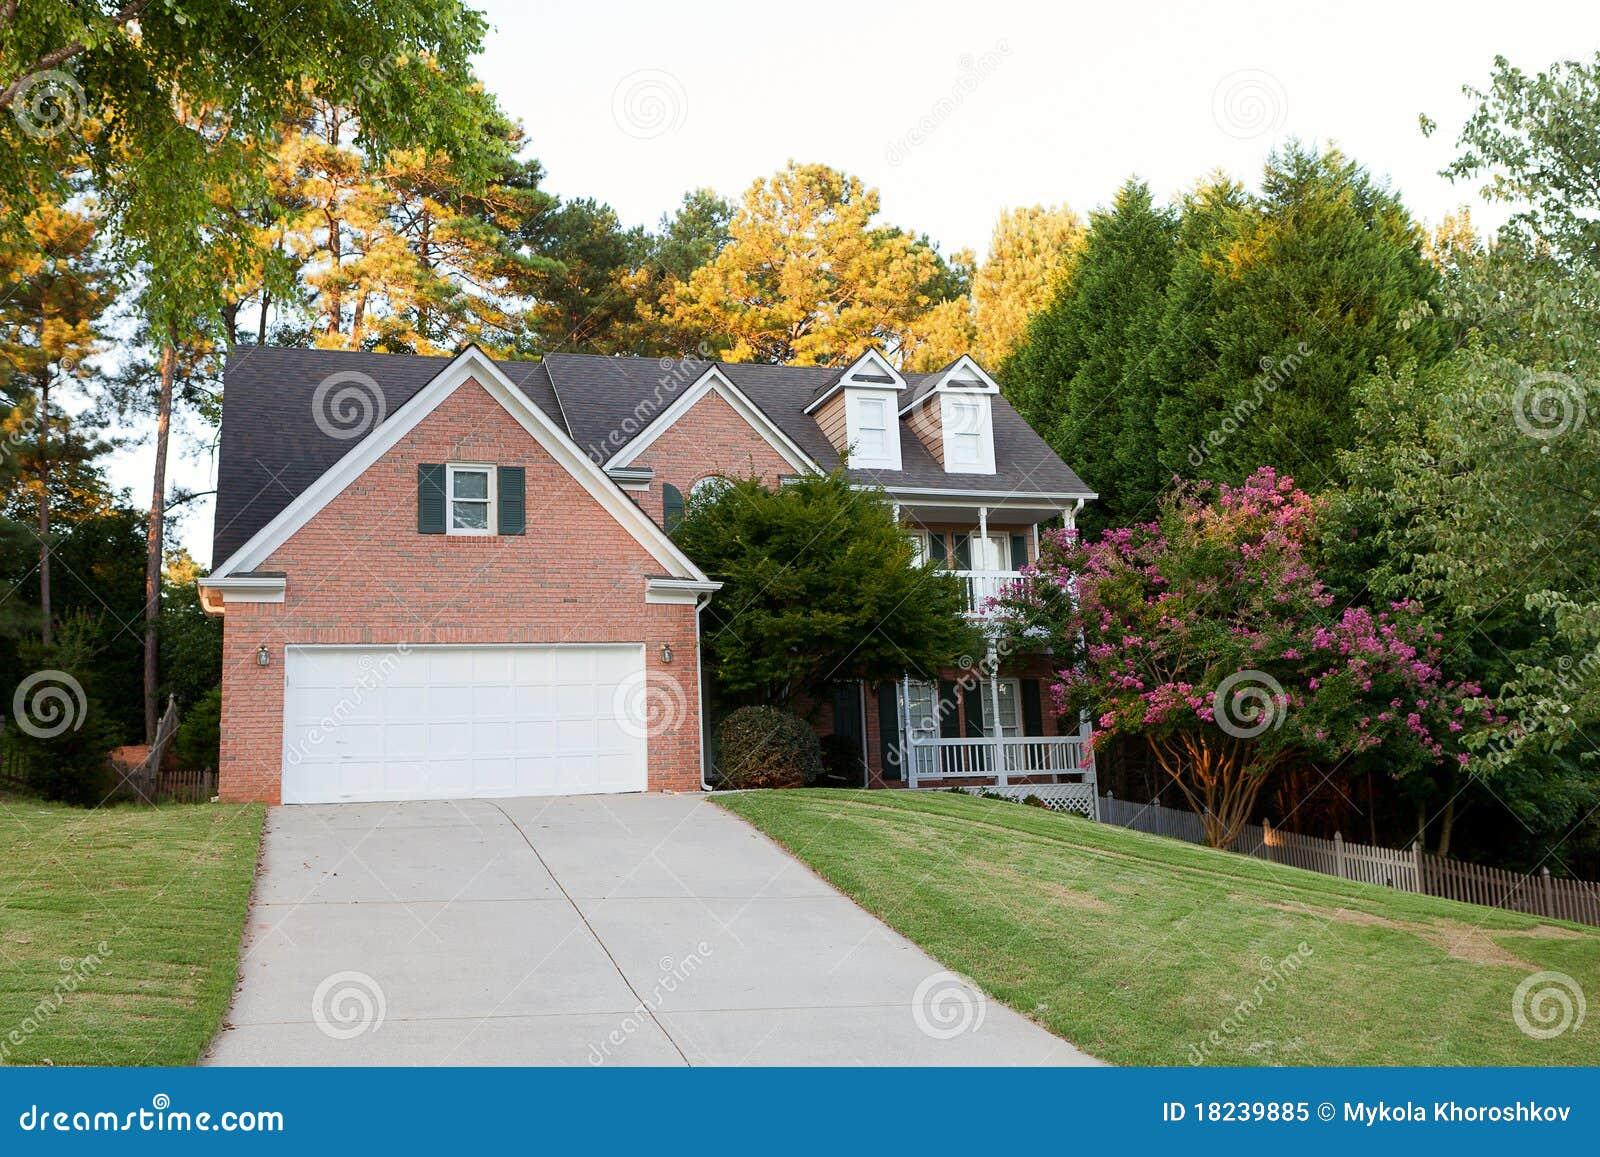 Download αμερικανικό σπίτι χαρακτη& στοκ εικόνα. εικόνα από πόρτα - 18239885